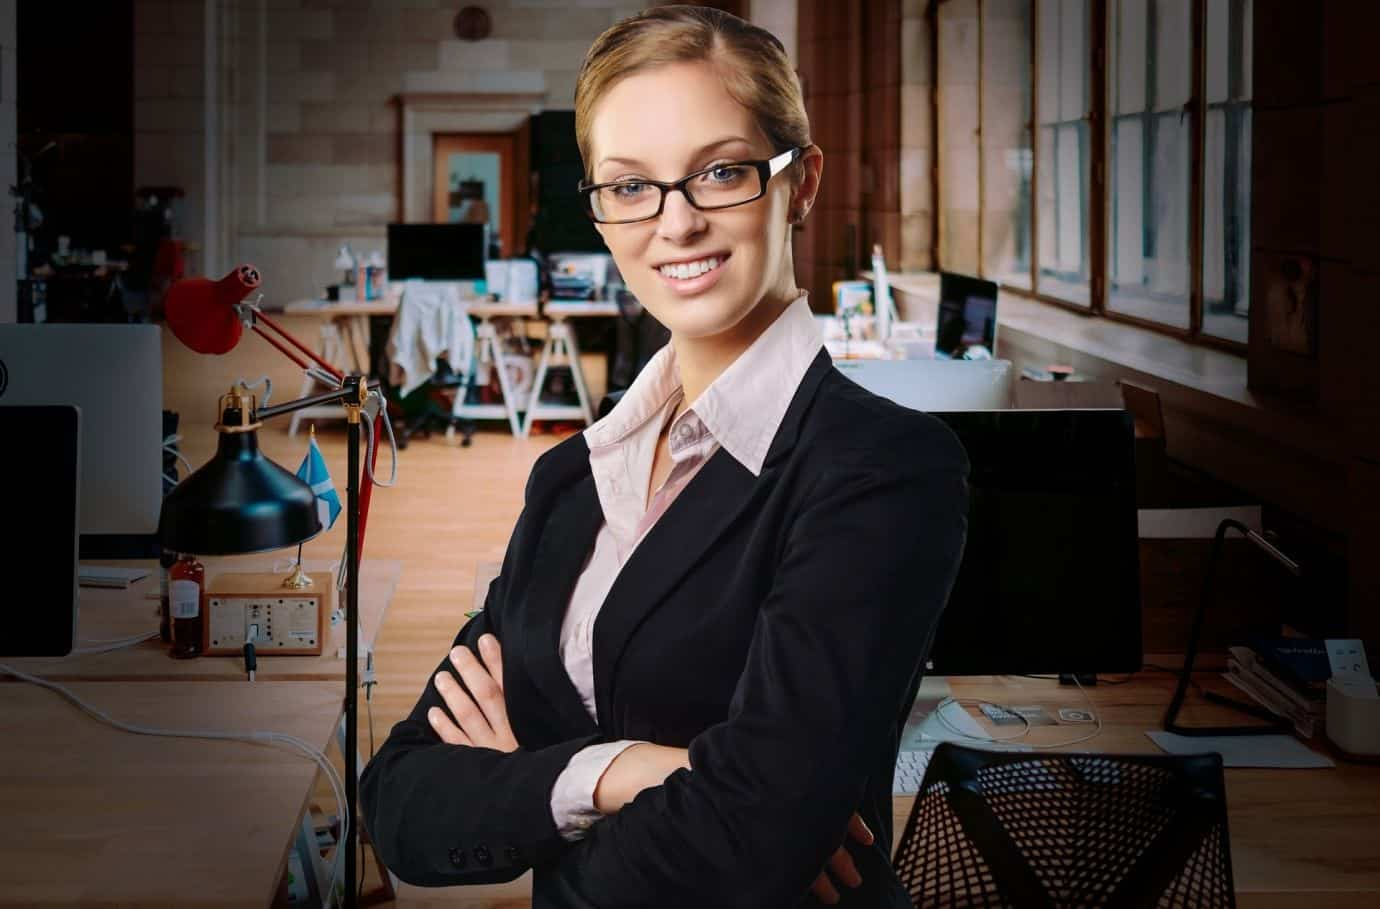 business girl smart professional